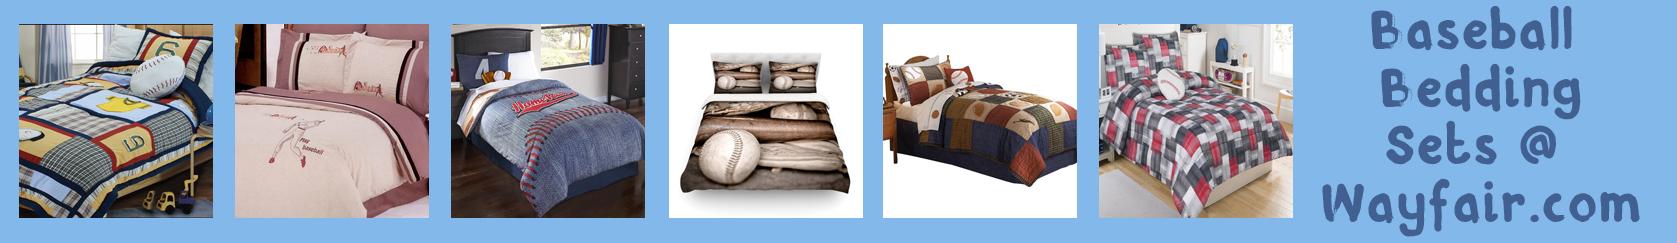 wayfair baseball bedding banner thin blue